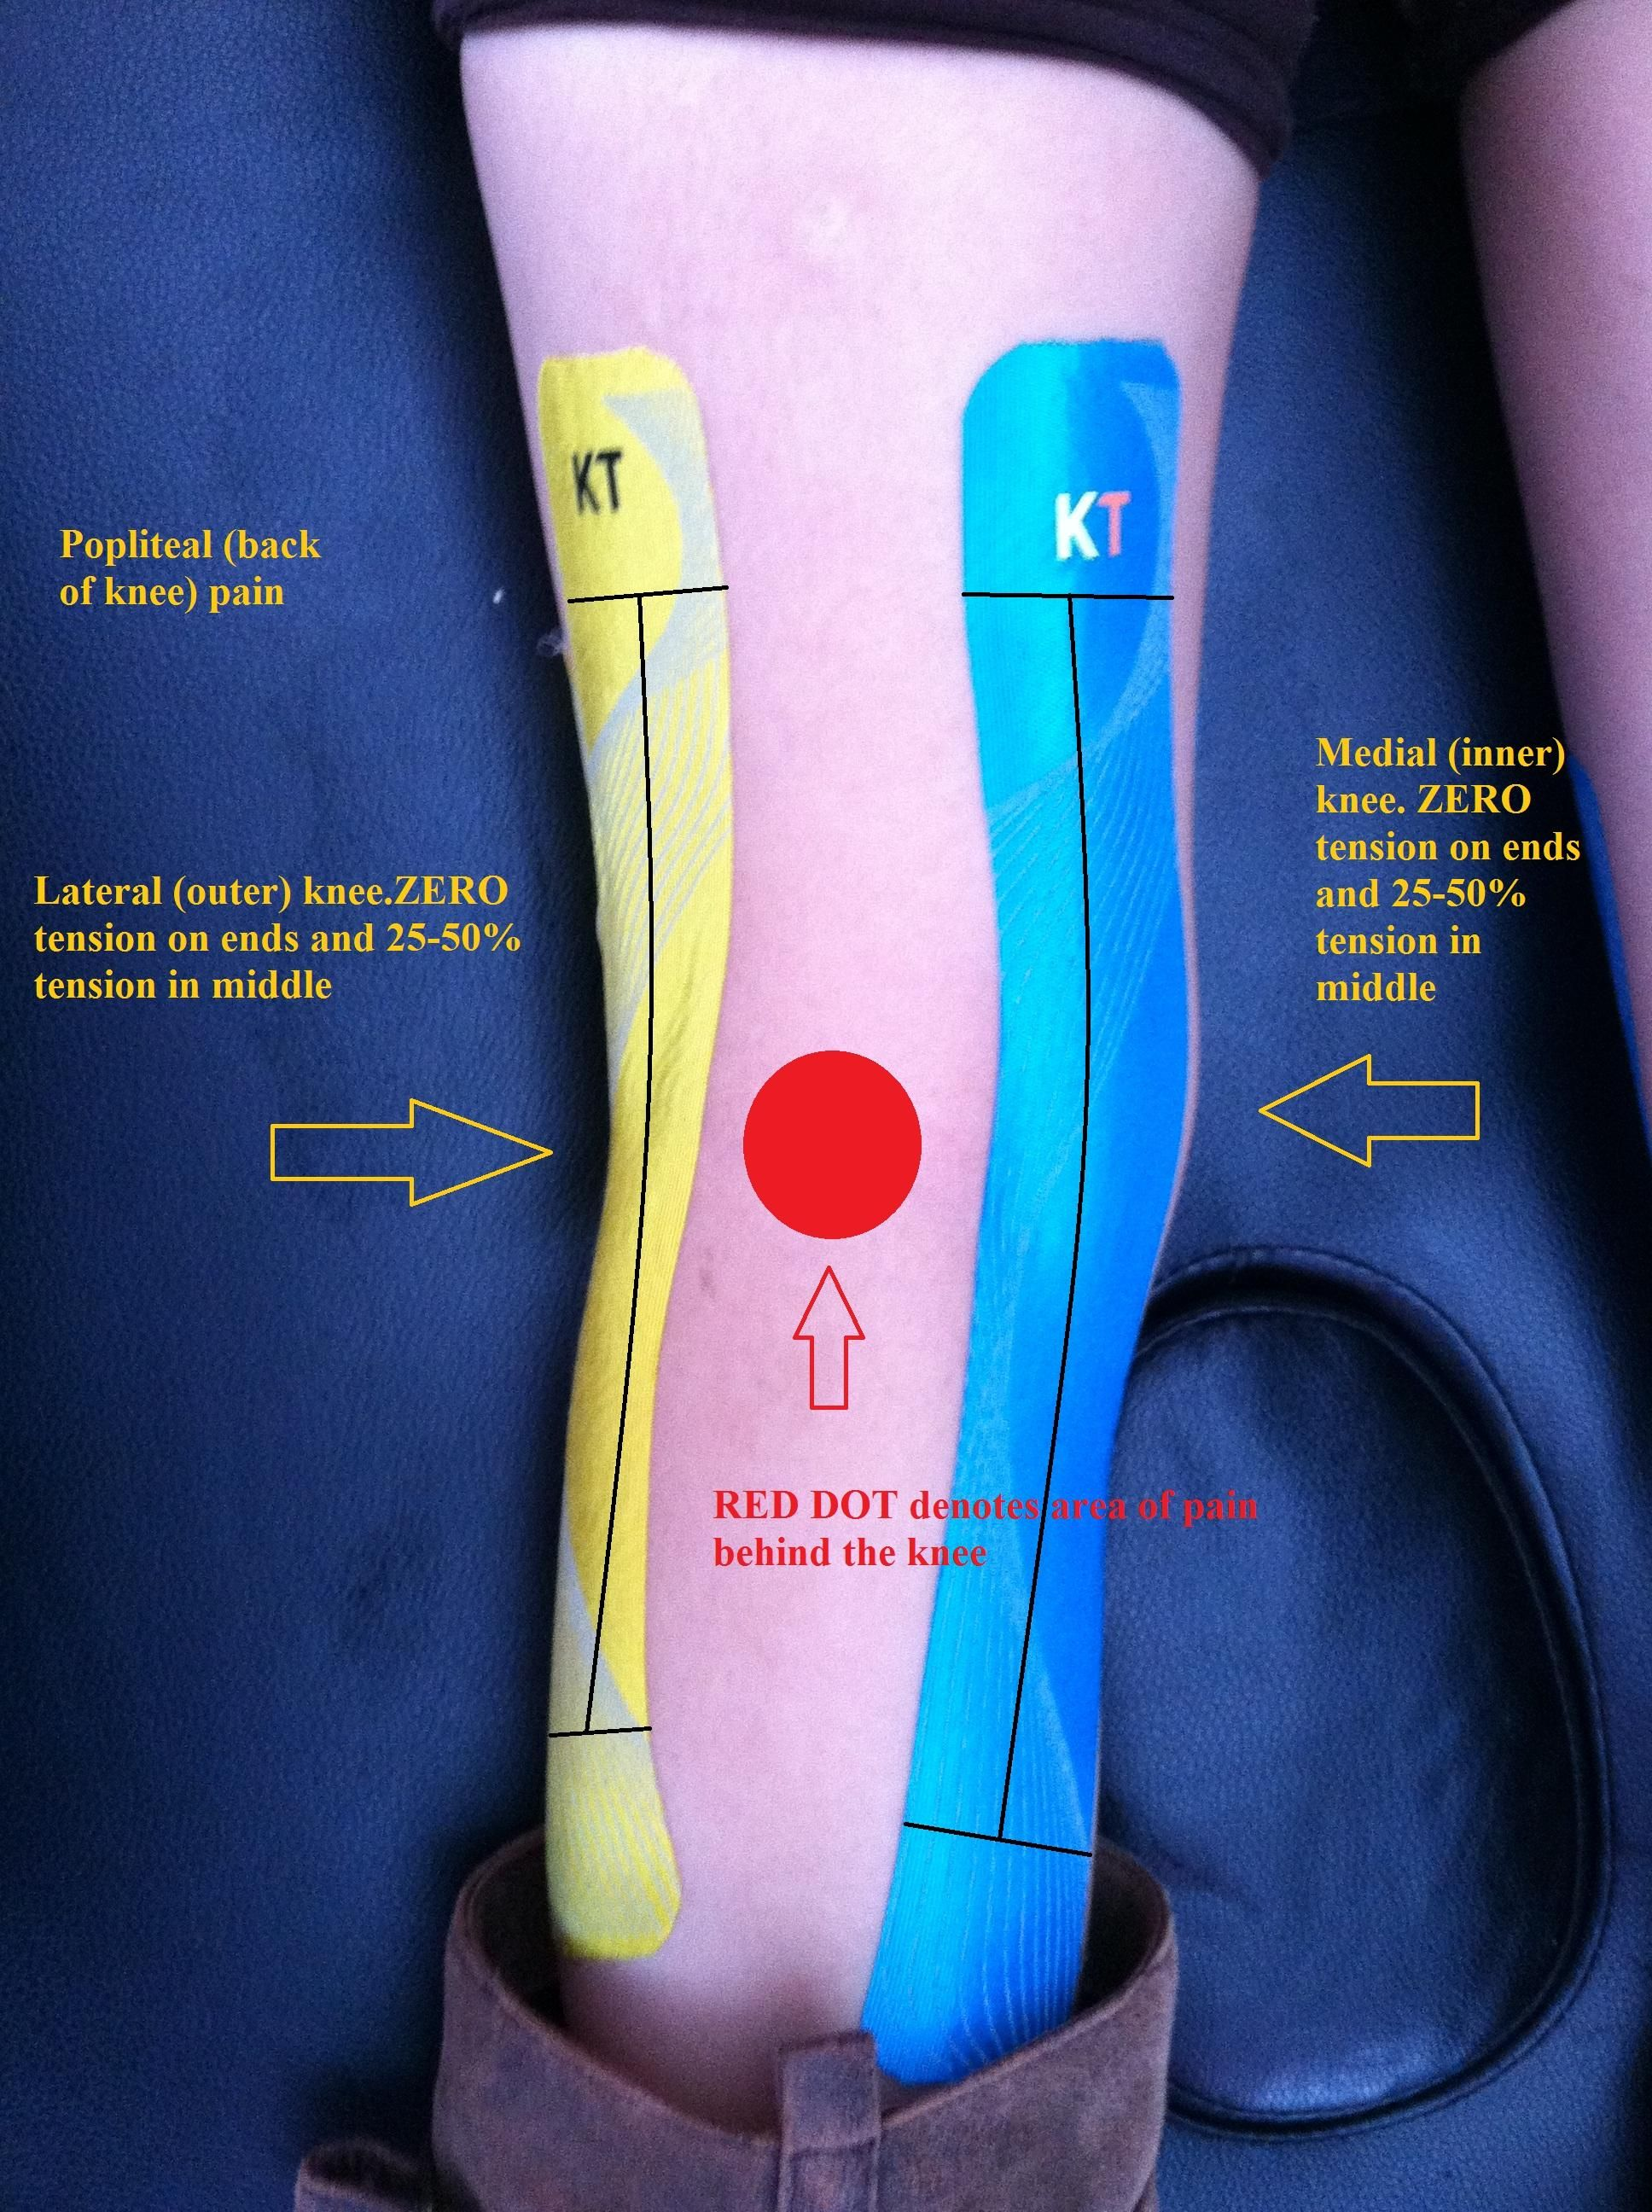 Popliteal behind the knee pain version 2 knee pain popliteal behind the knee pain version 2 kt pro pooptronica Image collections